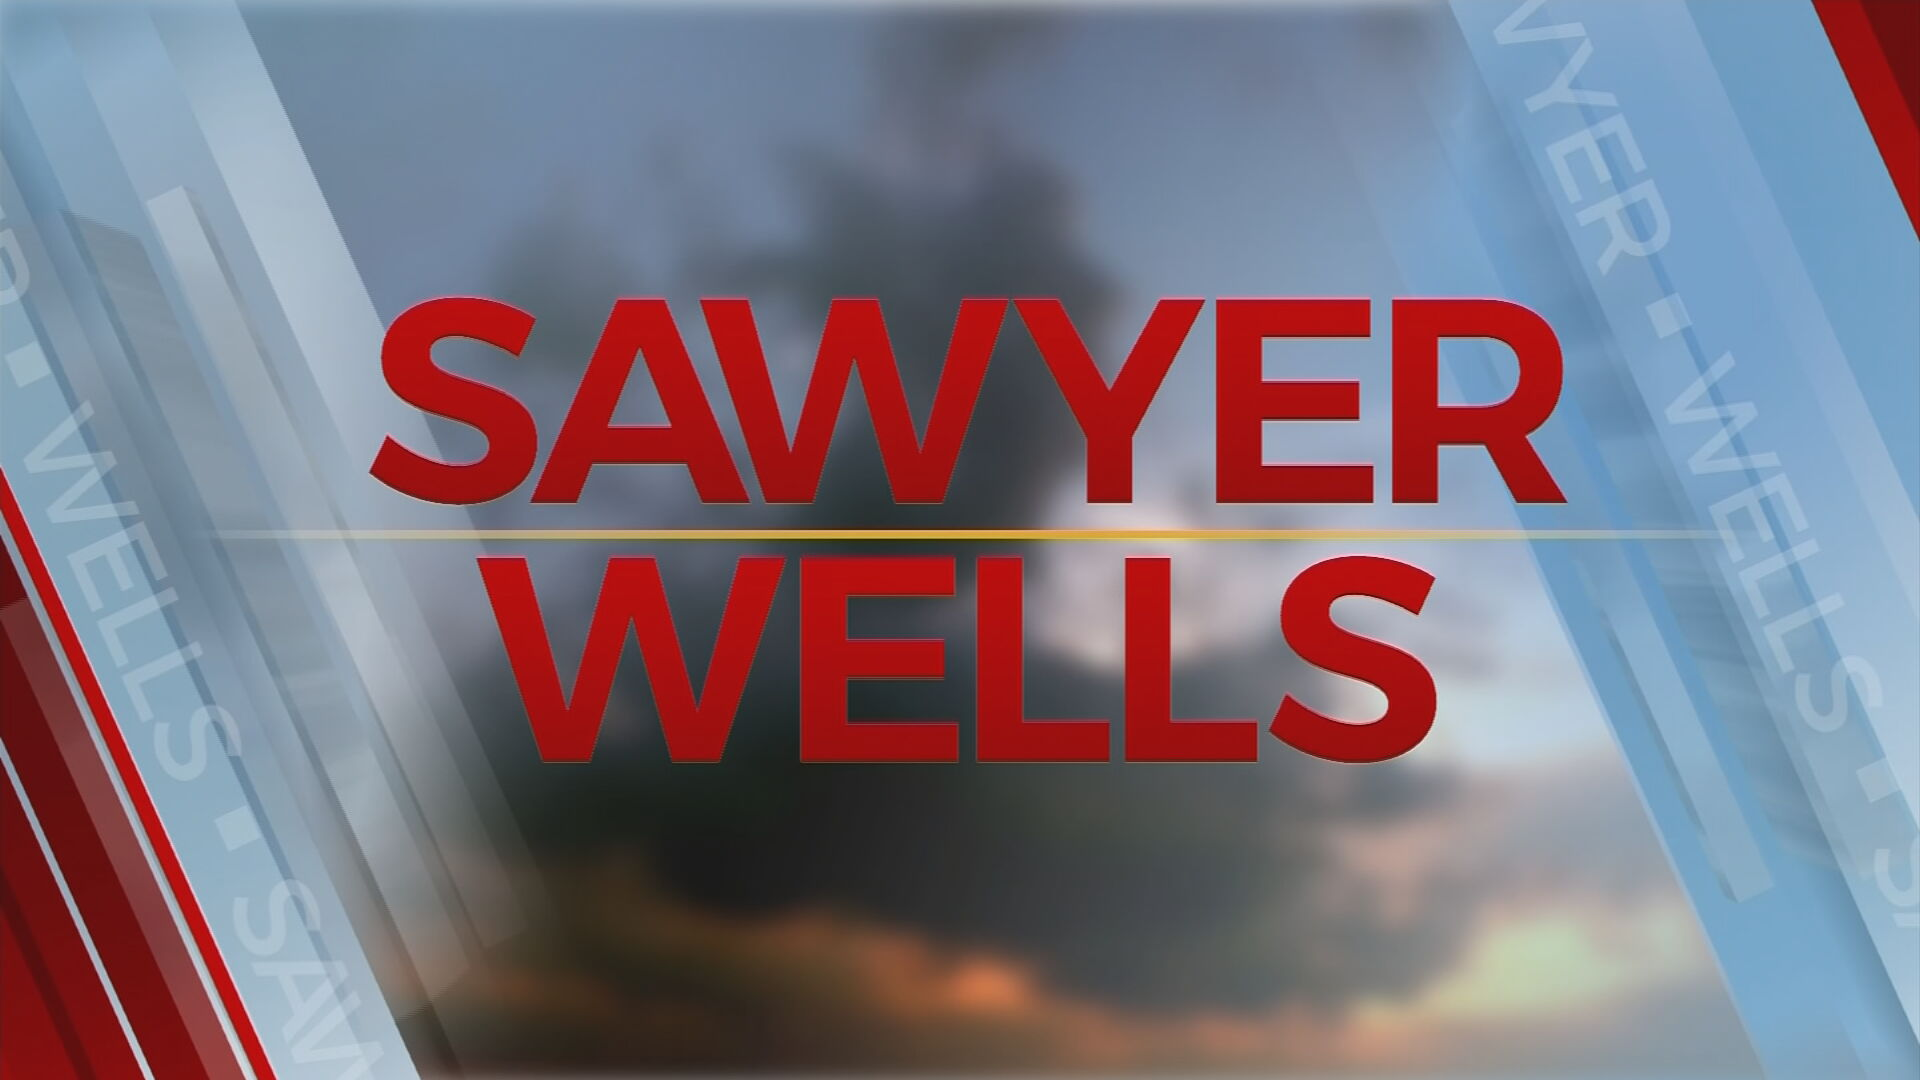 Saturday Forecast With Sawyer Wells